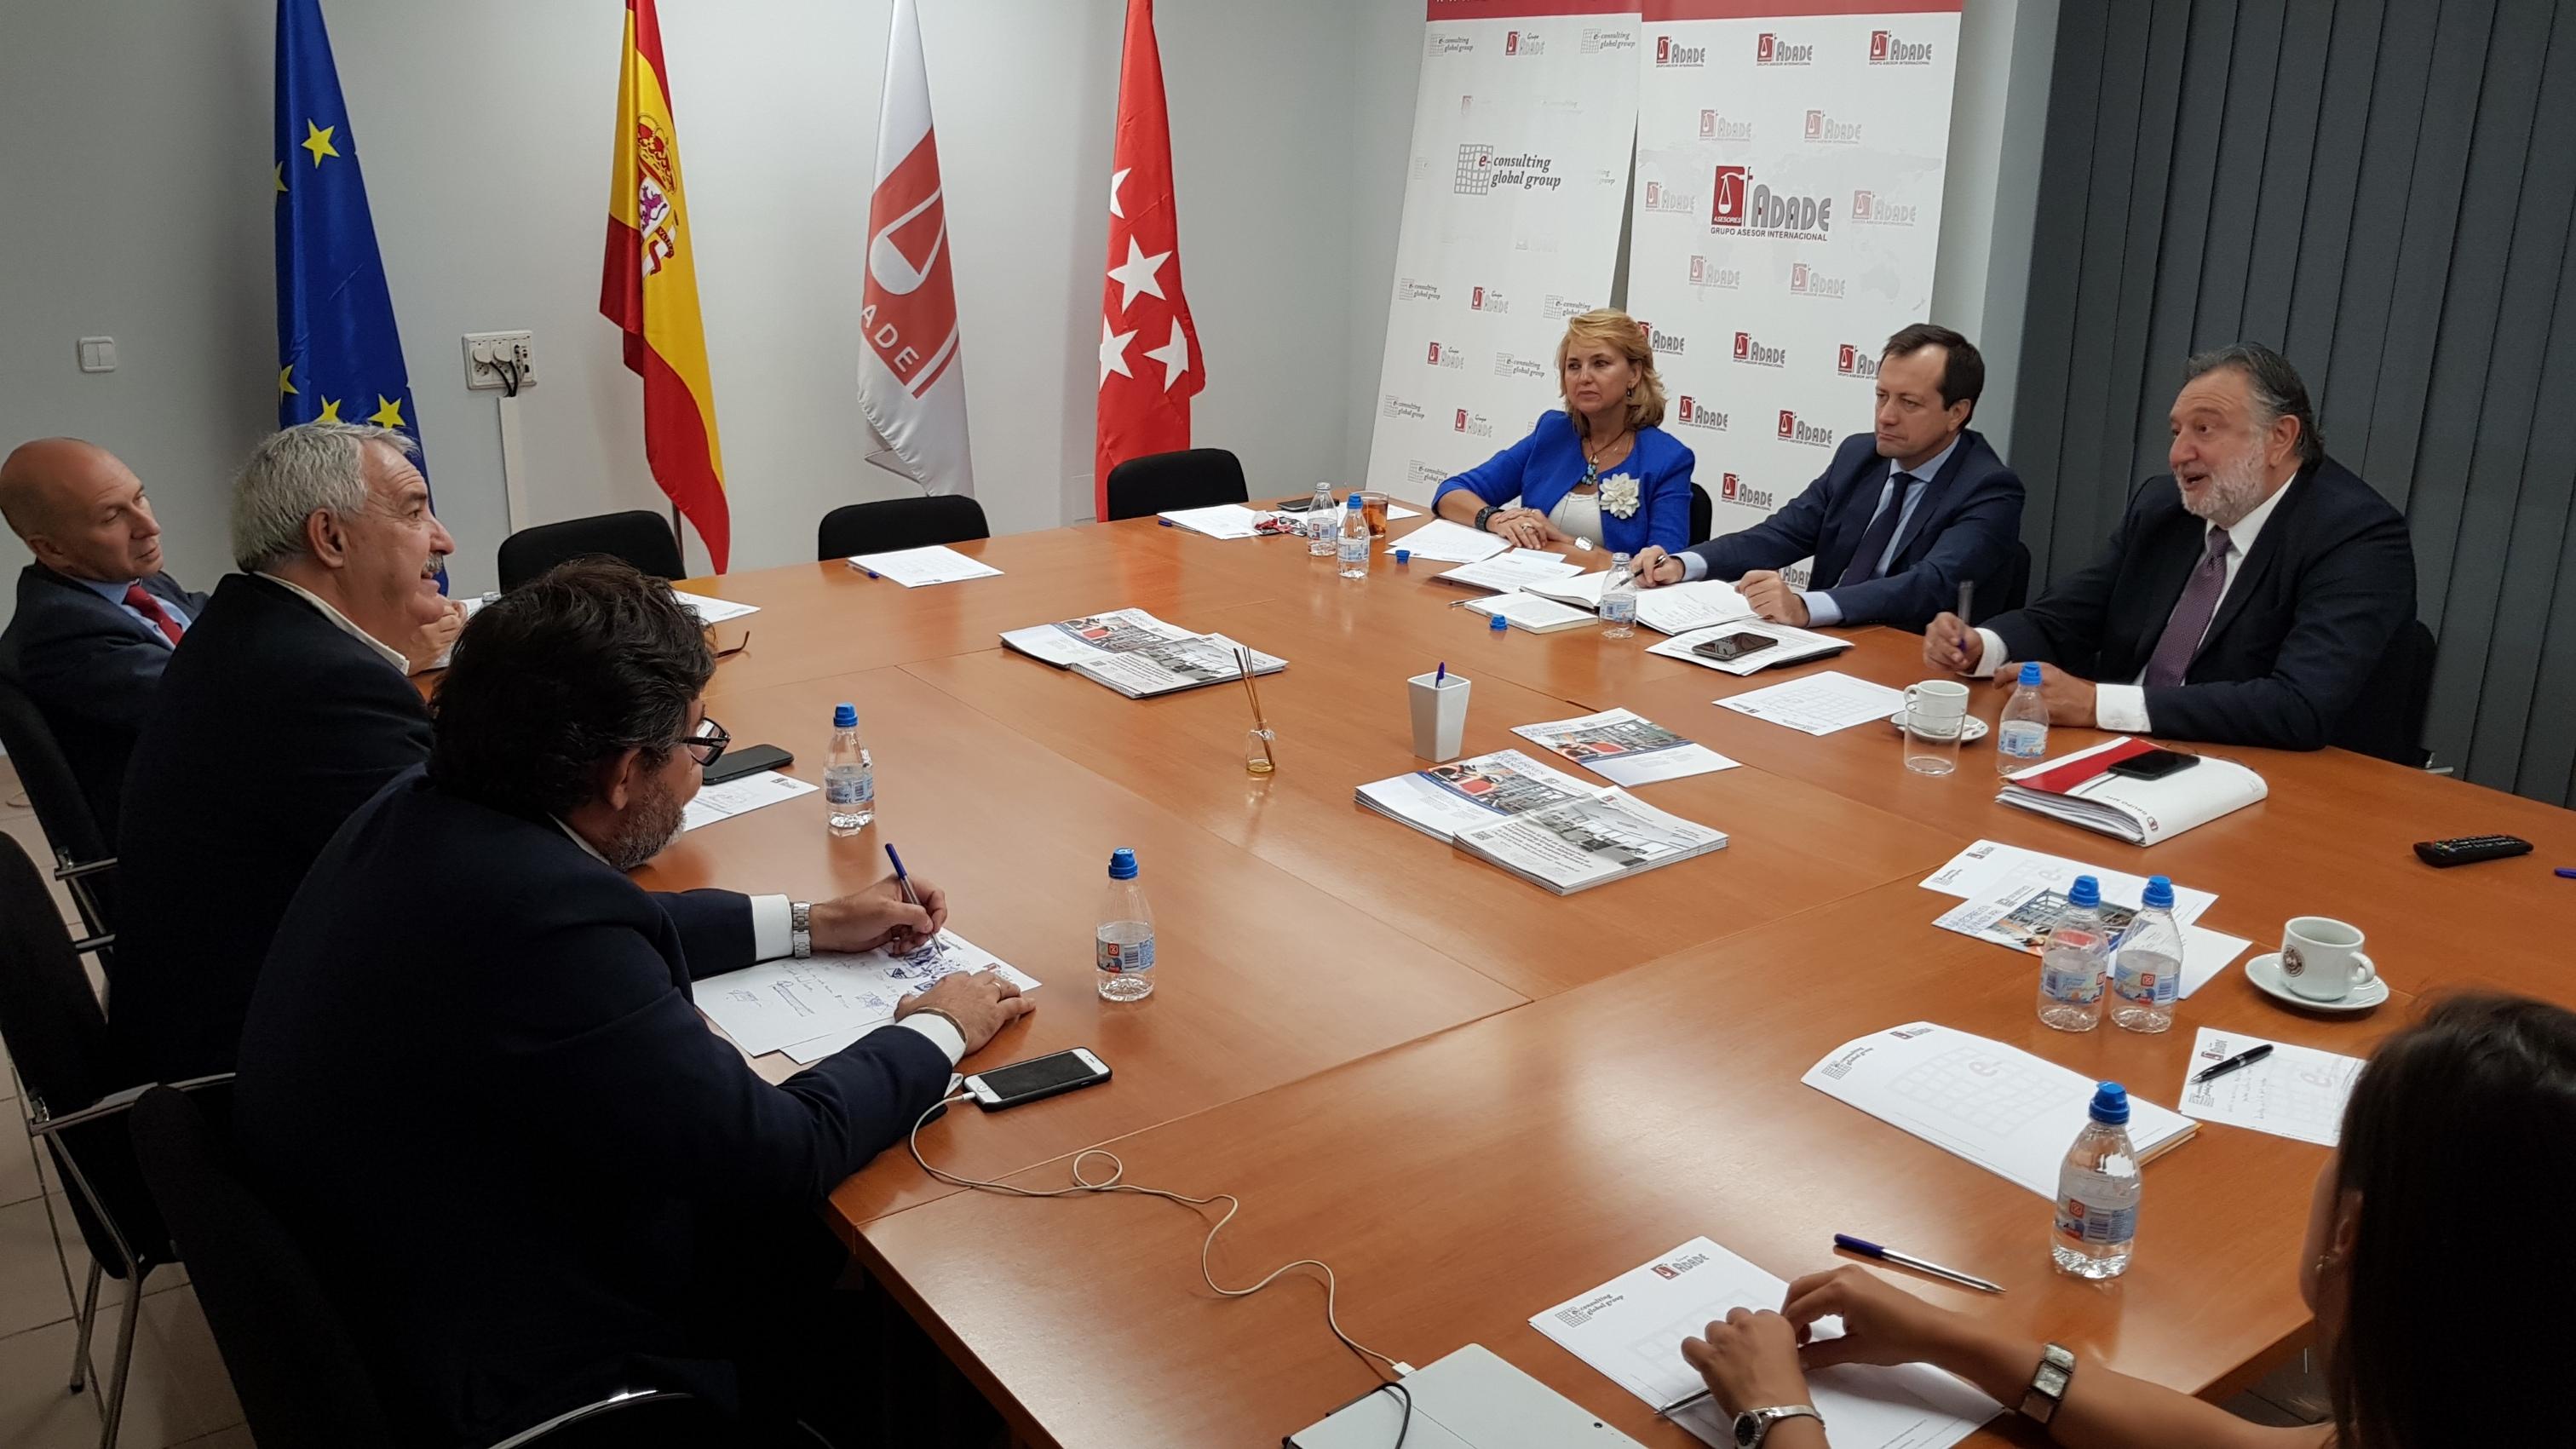 ADADE/E-Consulting participa en la Reunión Mensual de la Junta Directiva de FENAC | Sala de prensa Grupo Asesor ADADE y E-Consulting Global Group